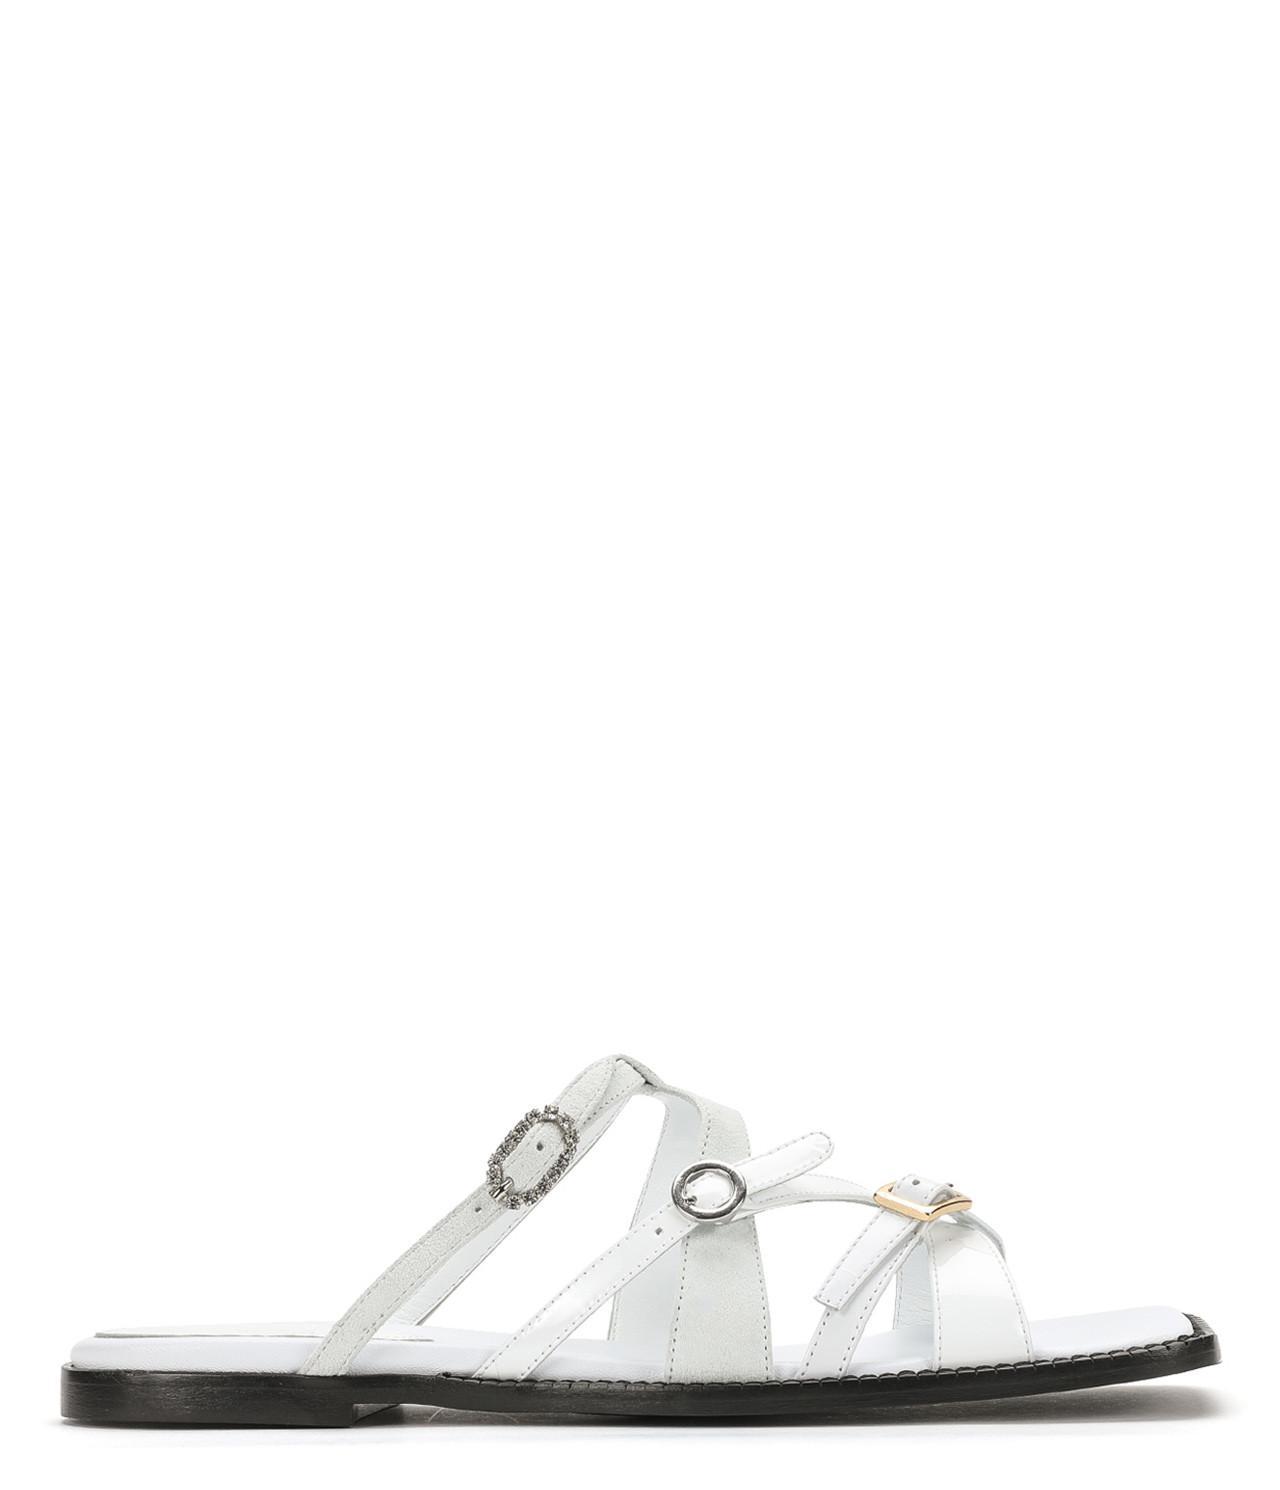 49bebb805241 MM6 by Maison Martin Margiela. Women s White Square Toe Multi-strap Sandal